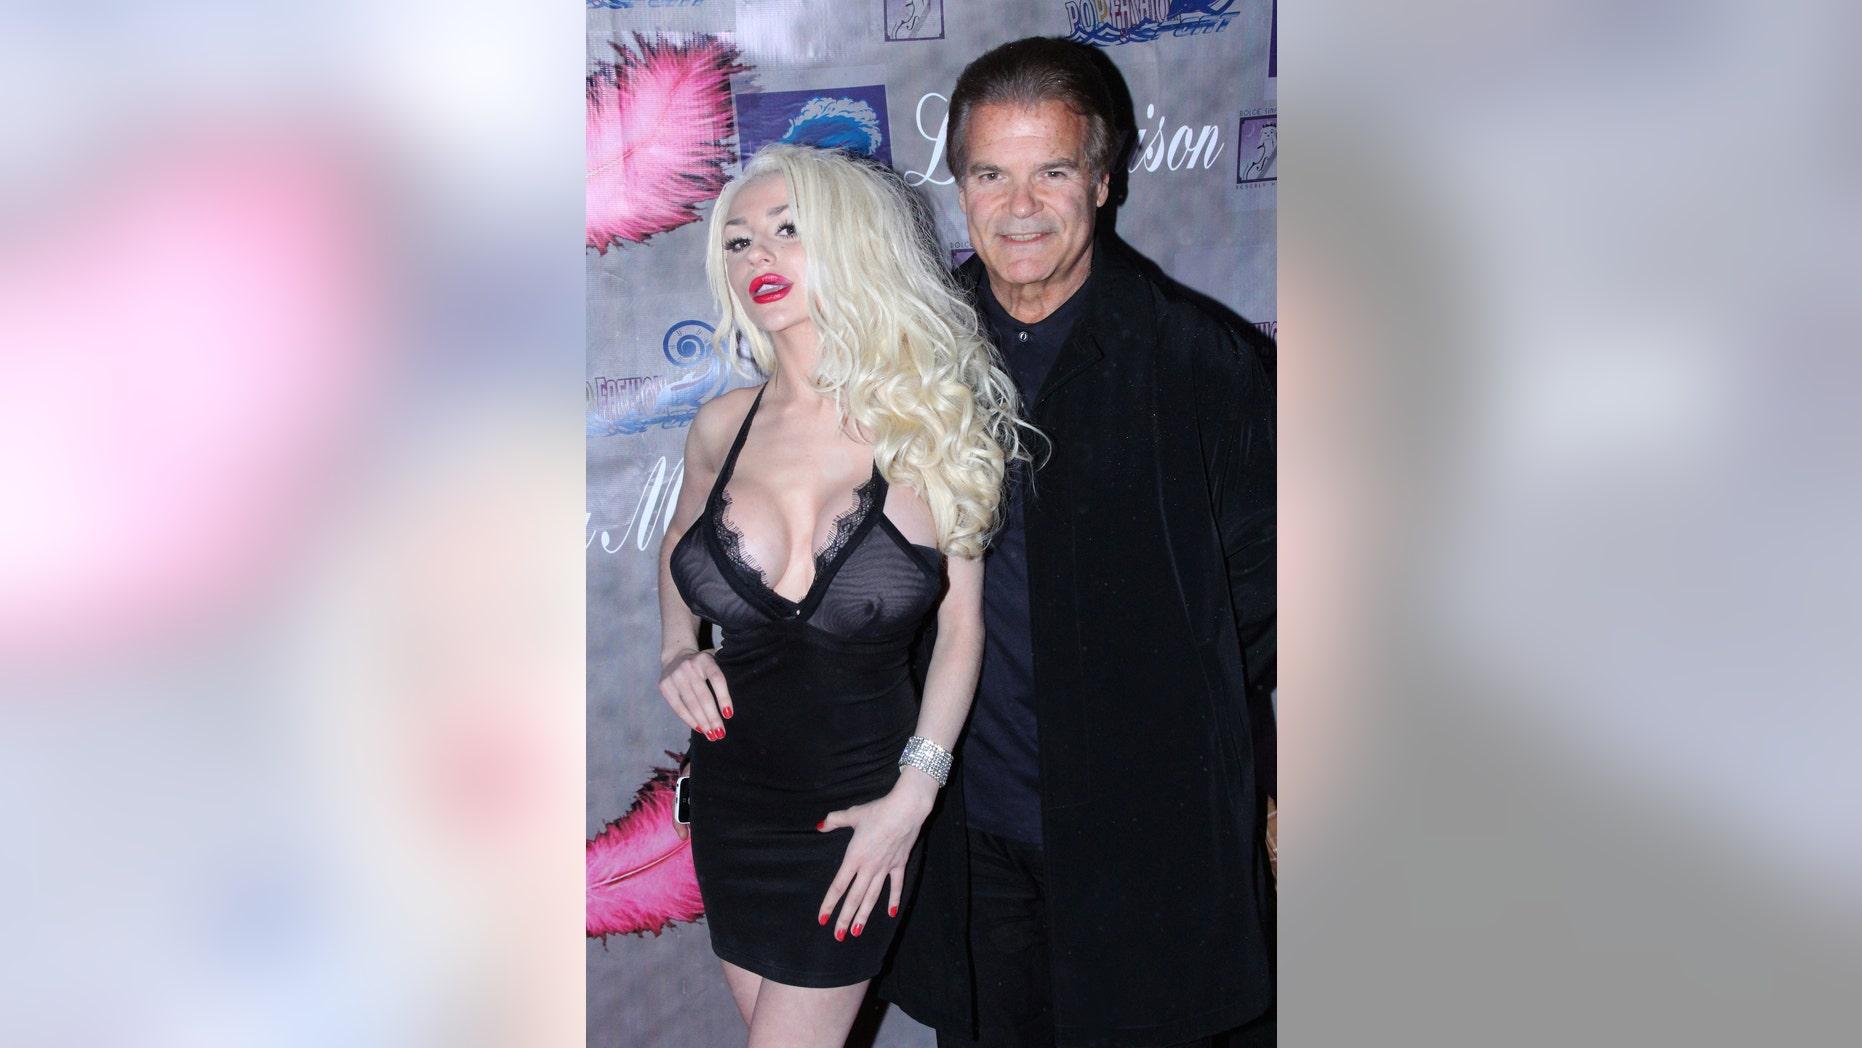 Courtney Stodden is shown at Studio City, Calif.,  with Edward Lozzi on Nov. 21, 2013.